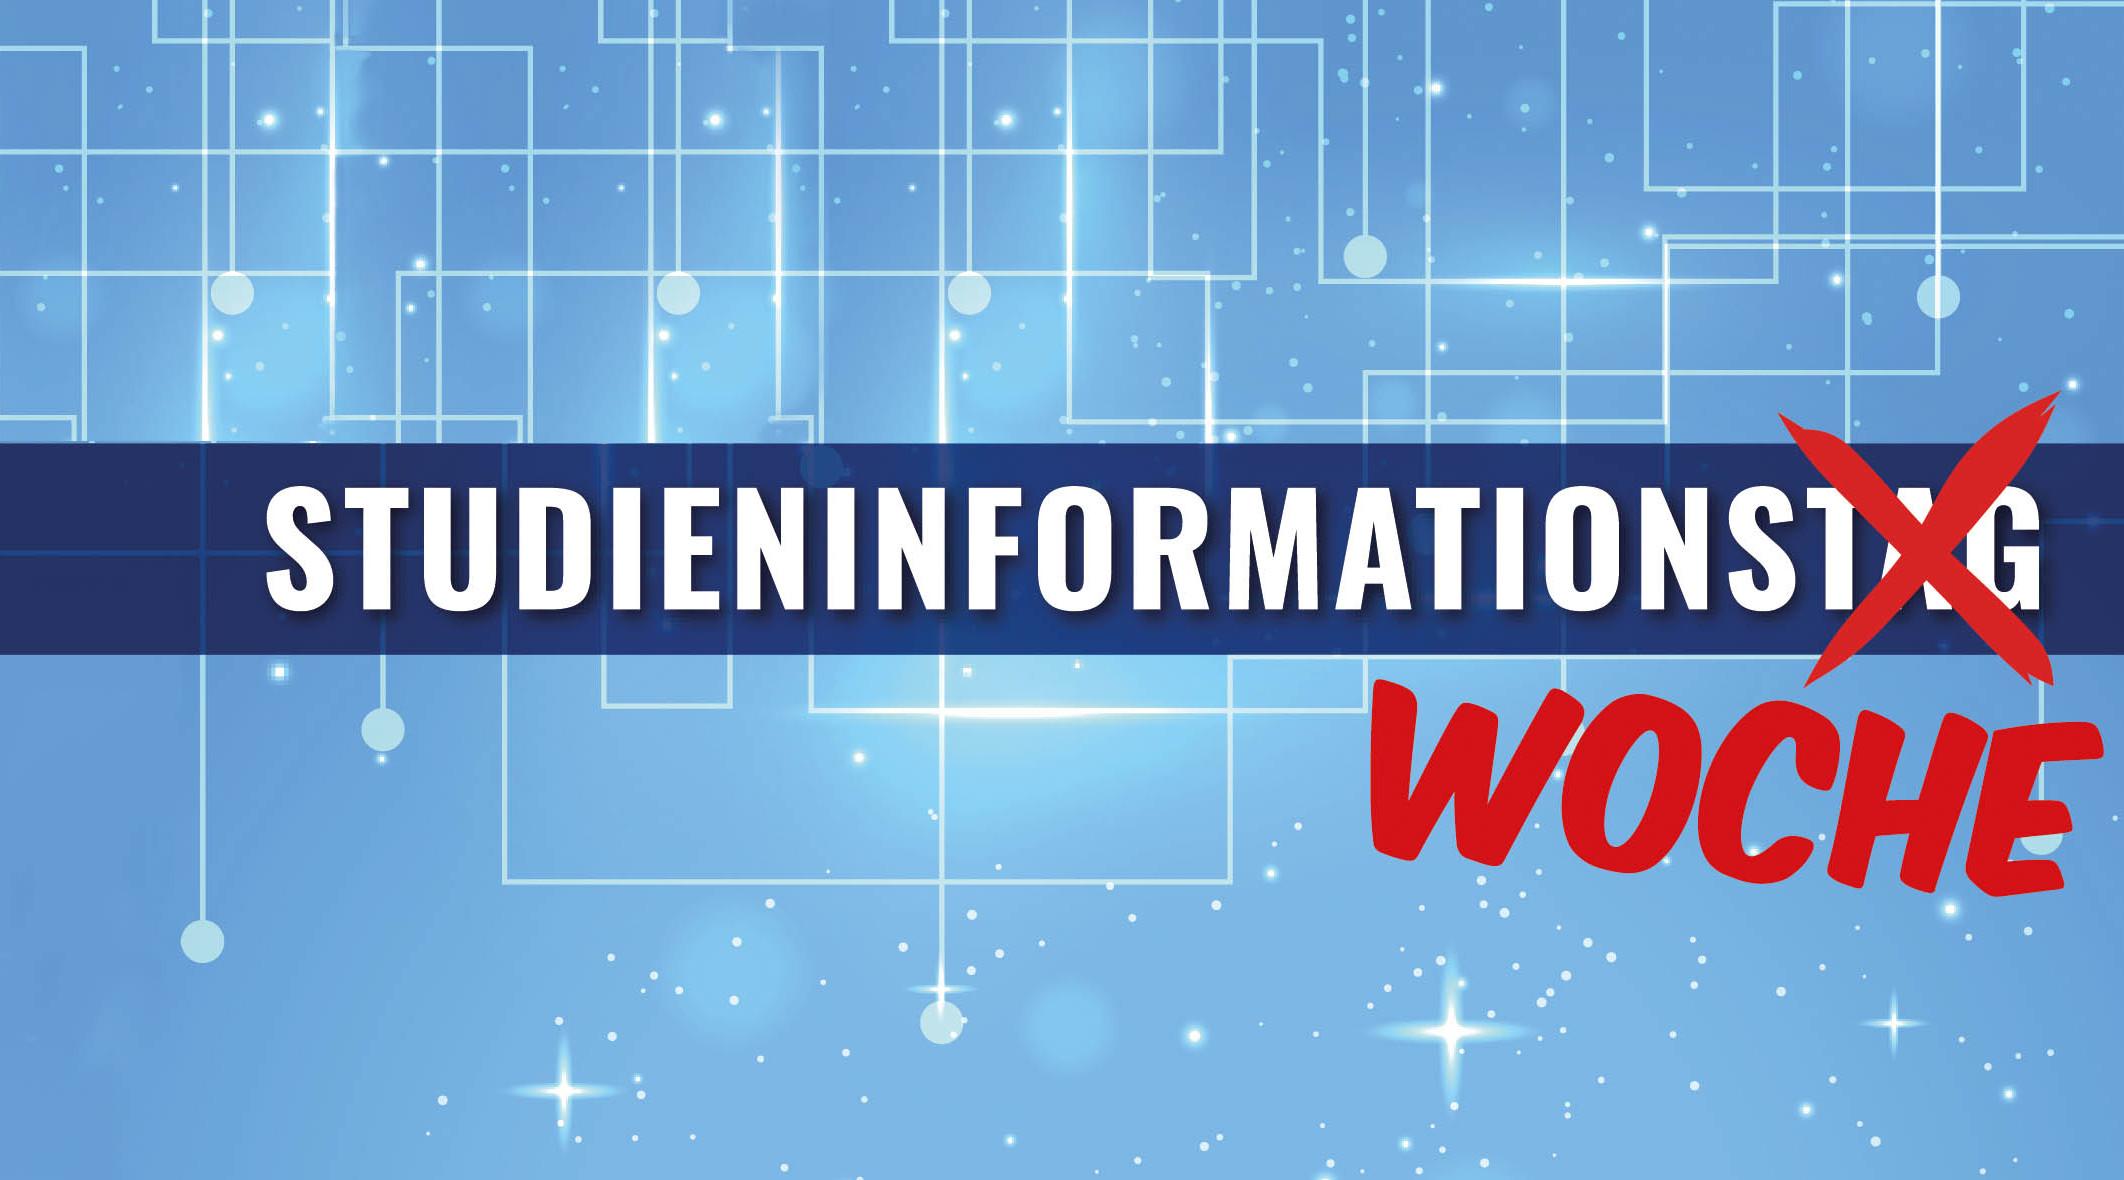 Student Information Week 2020